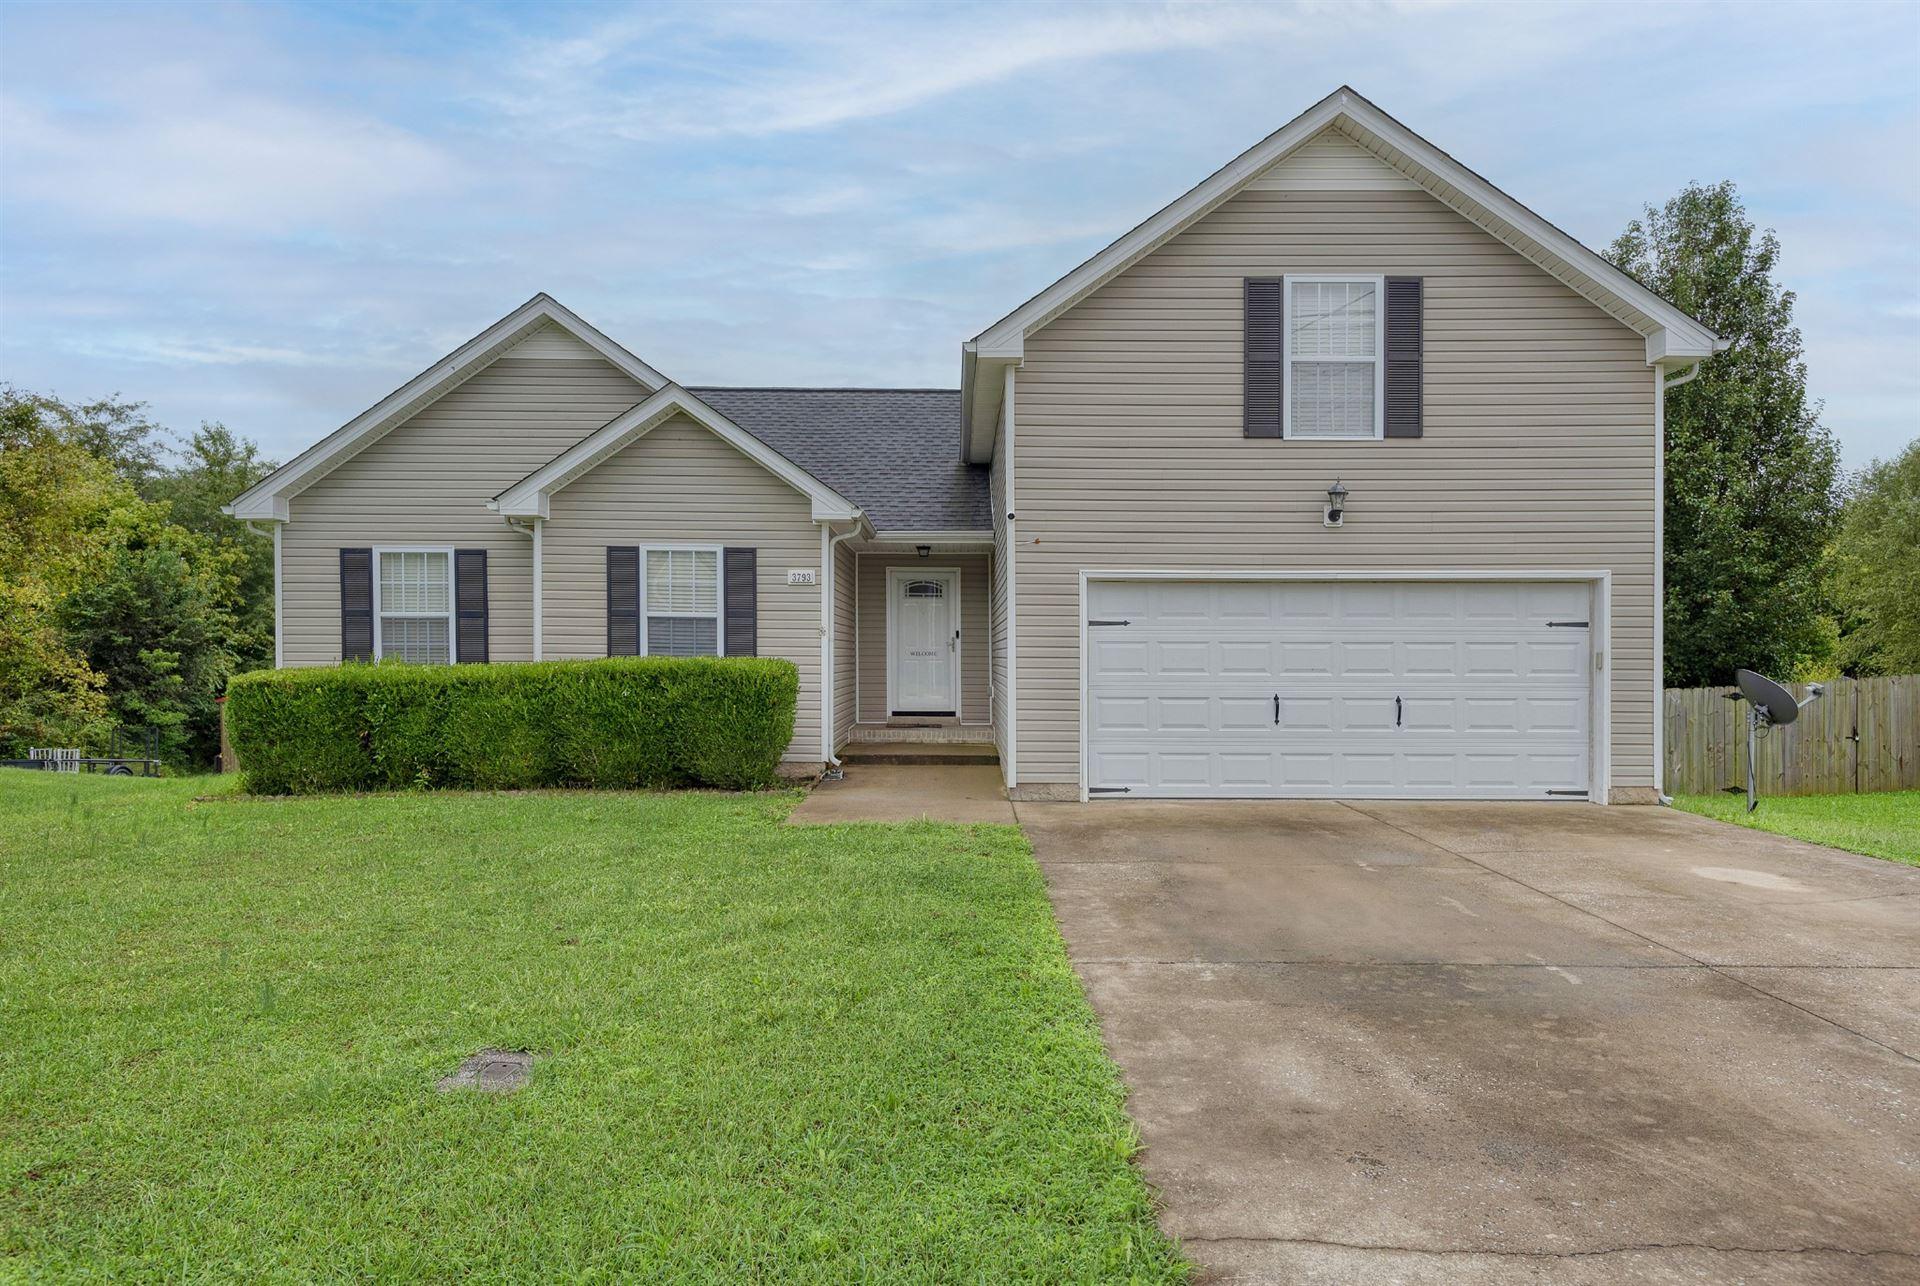 3793 Man O War Blvd, Clarksville, TN 37042 - MLS#: 2293429